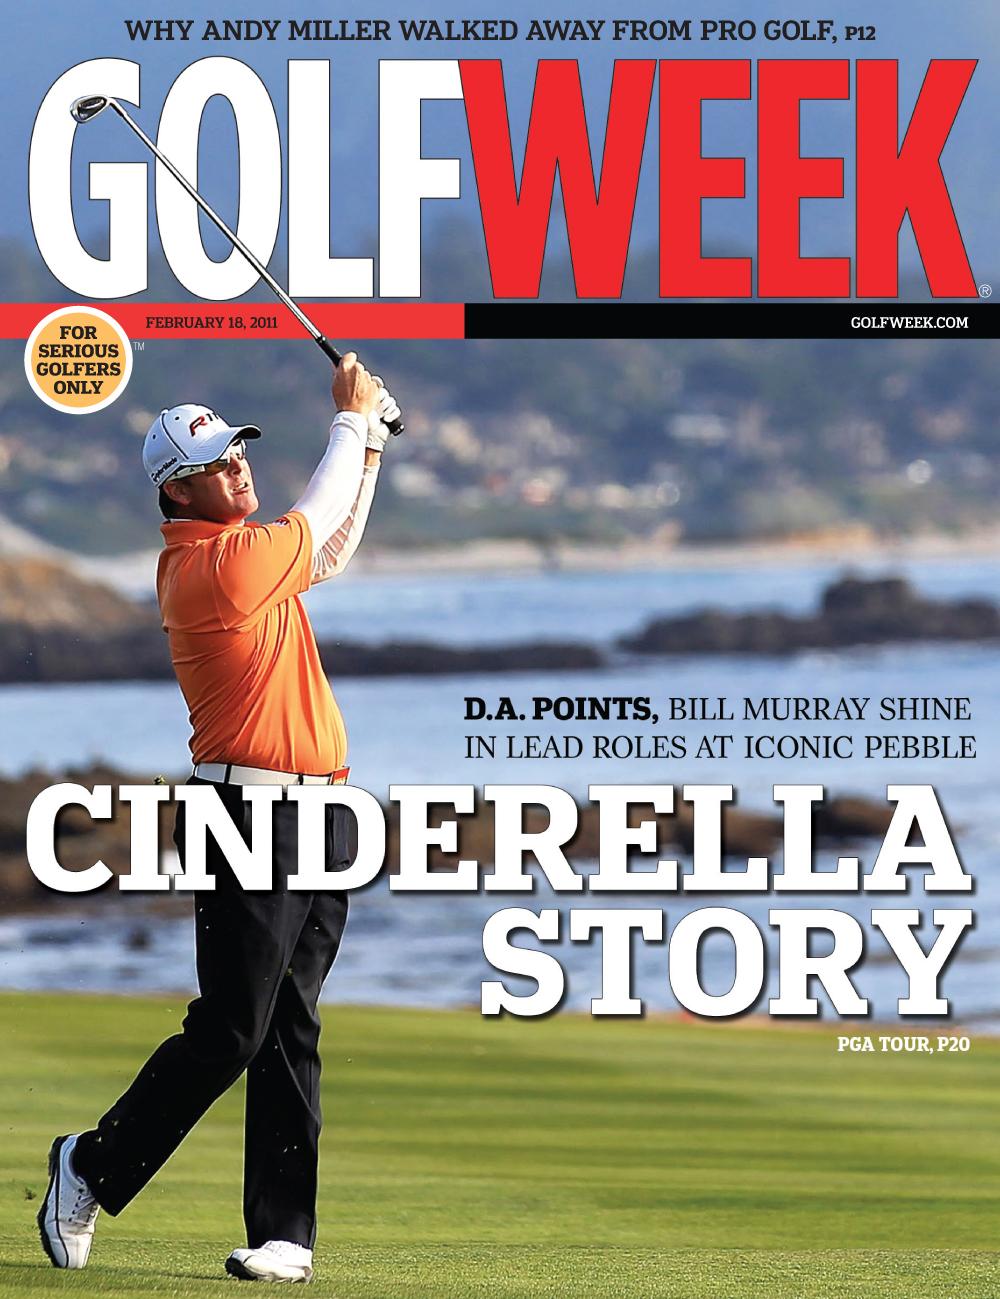 Golfweek (Feb. 18, 2011)